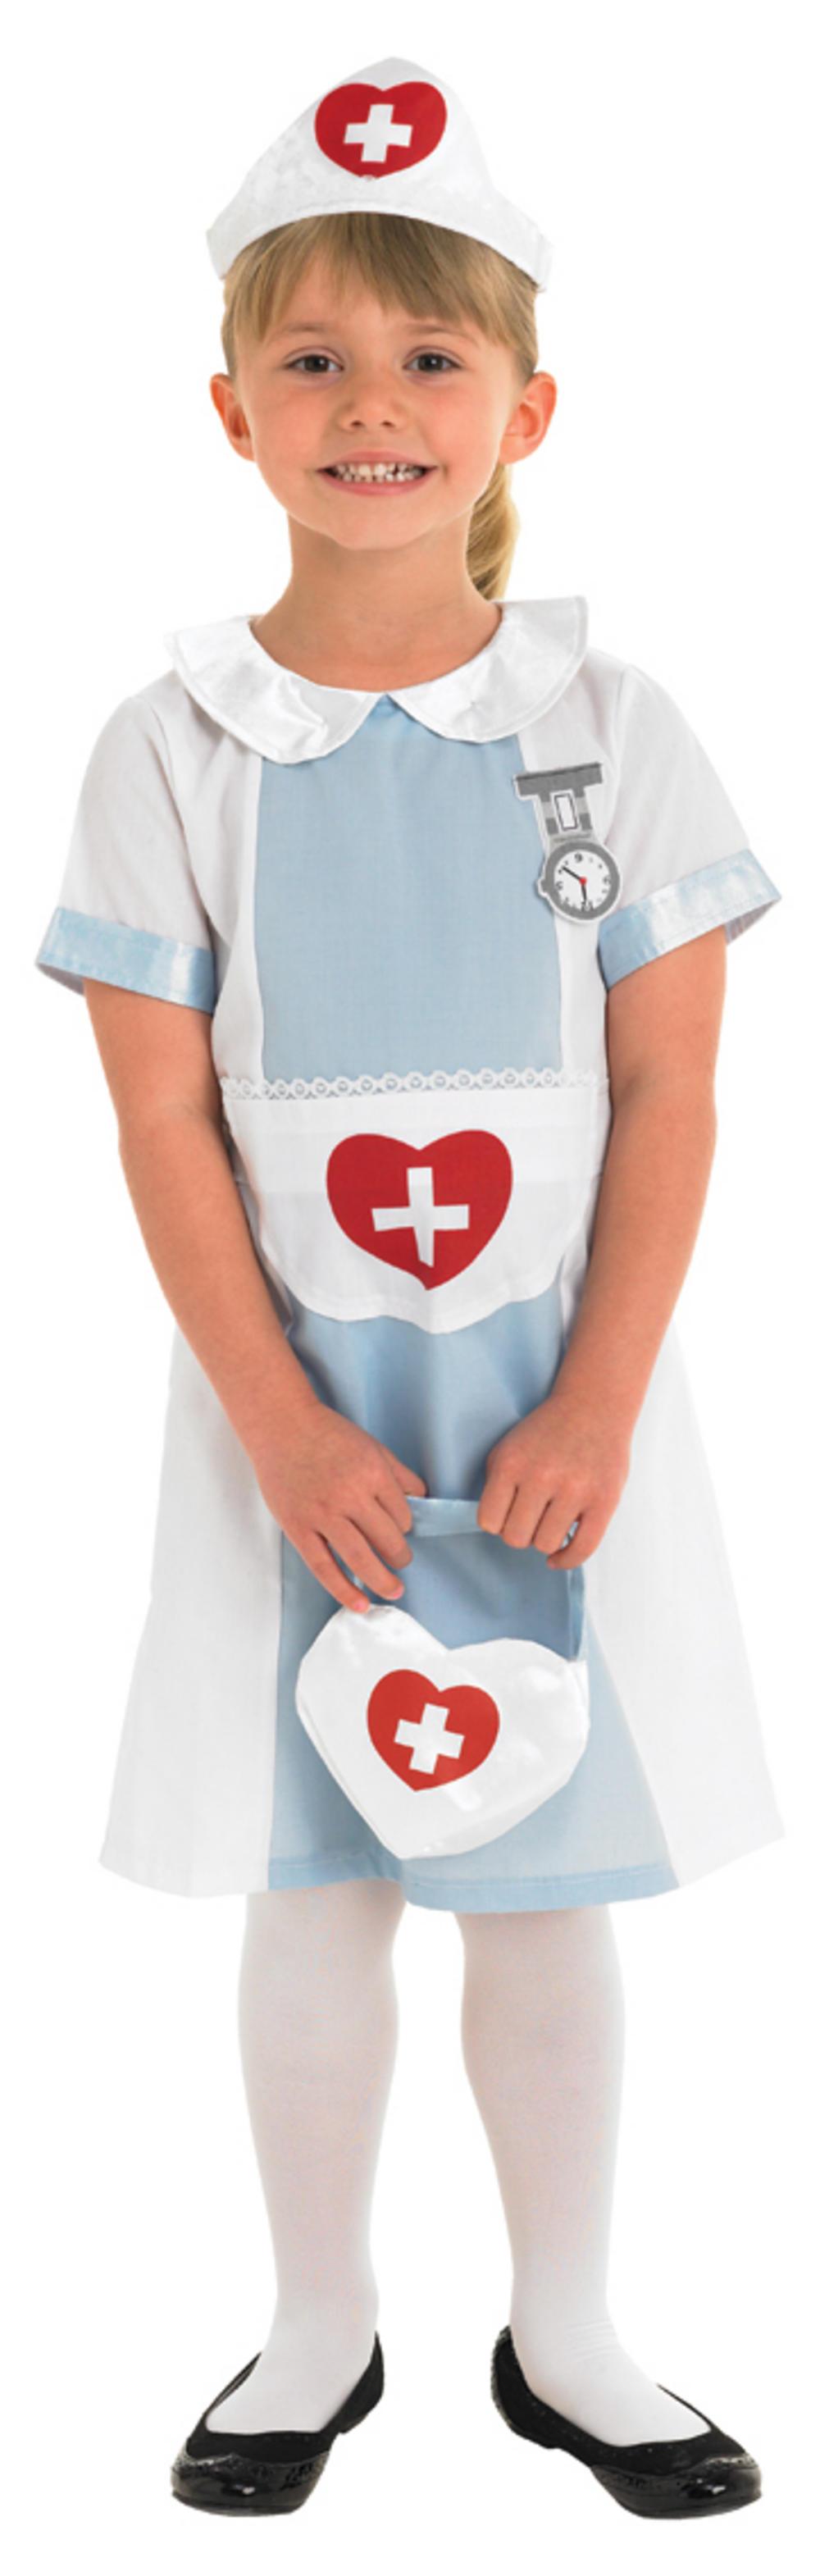 Girls Nurse Uniform Costume